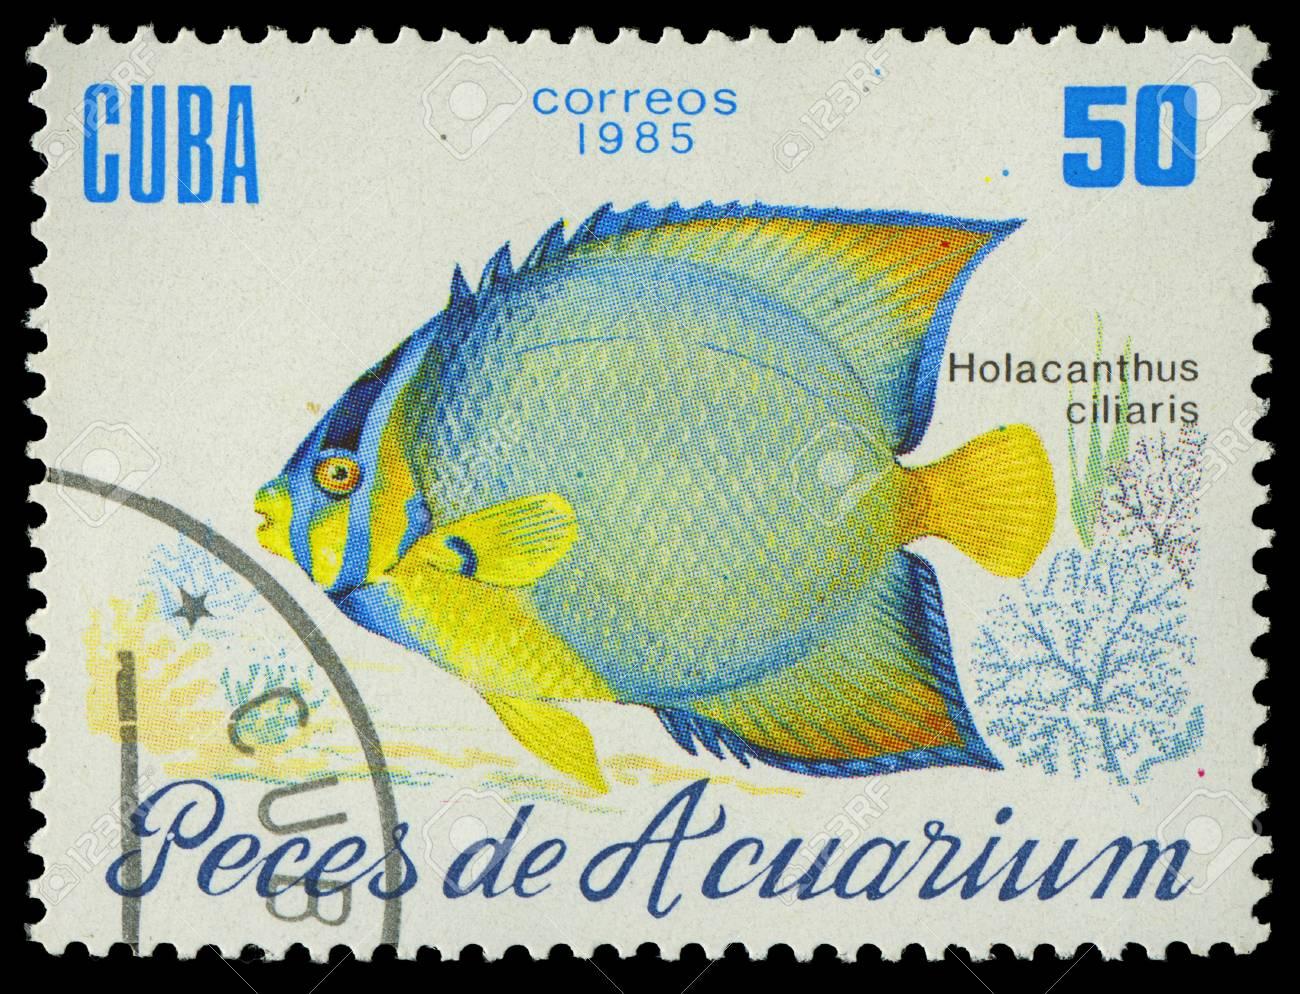 CUBA-CIRCA 1985  A stamp printed in Cuba shows fish Holacanthus ciliaris, circa 1985 Stock Photo - 17950379